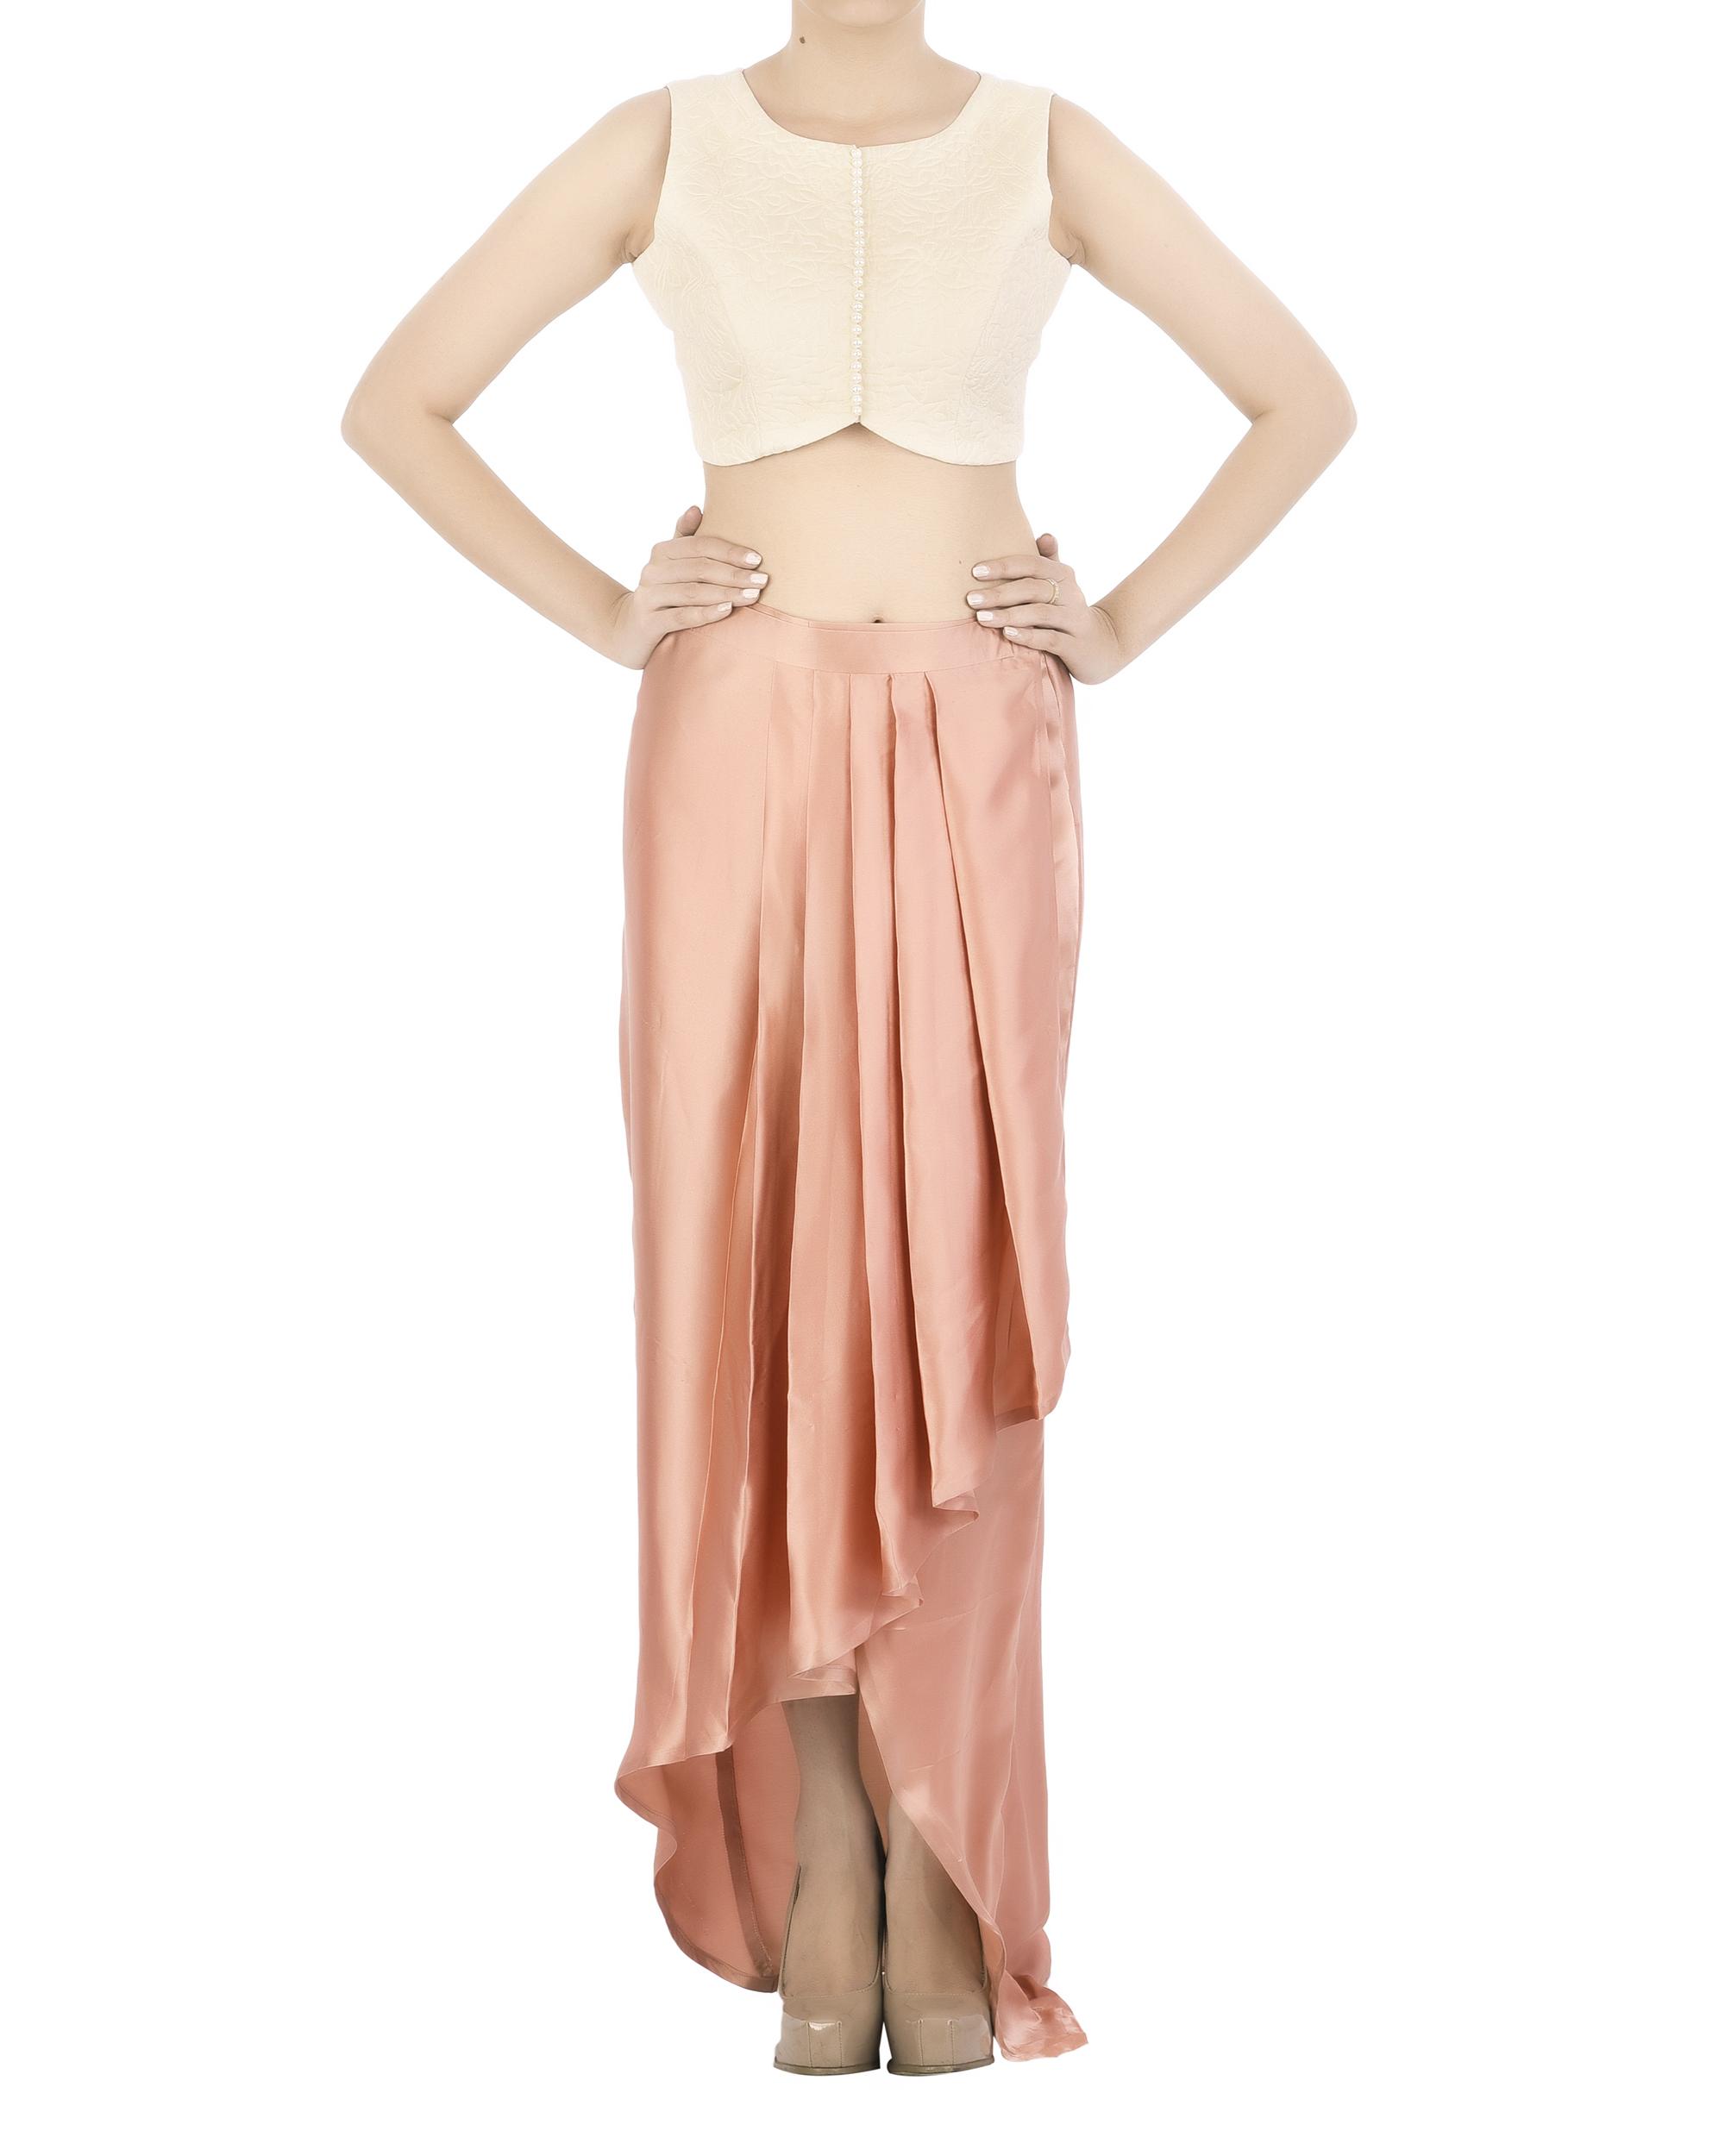 Draped satin skirt